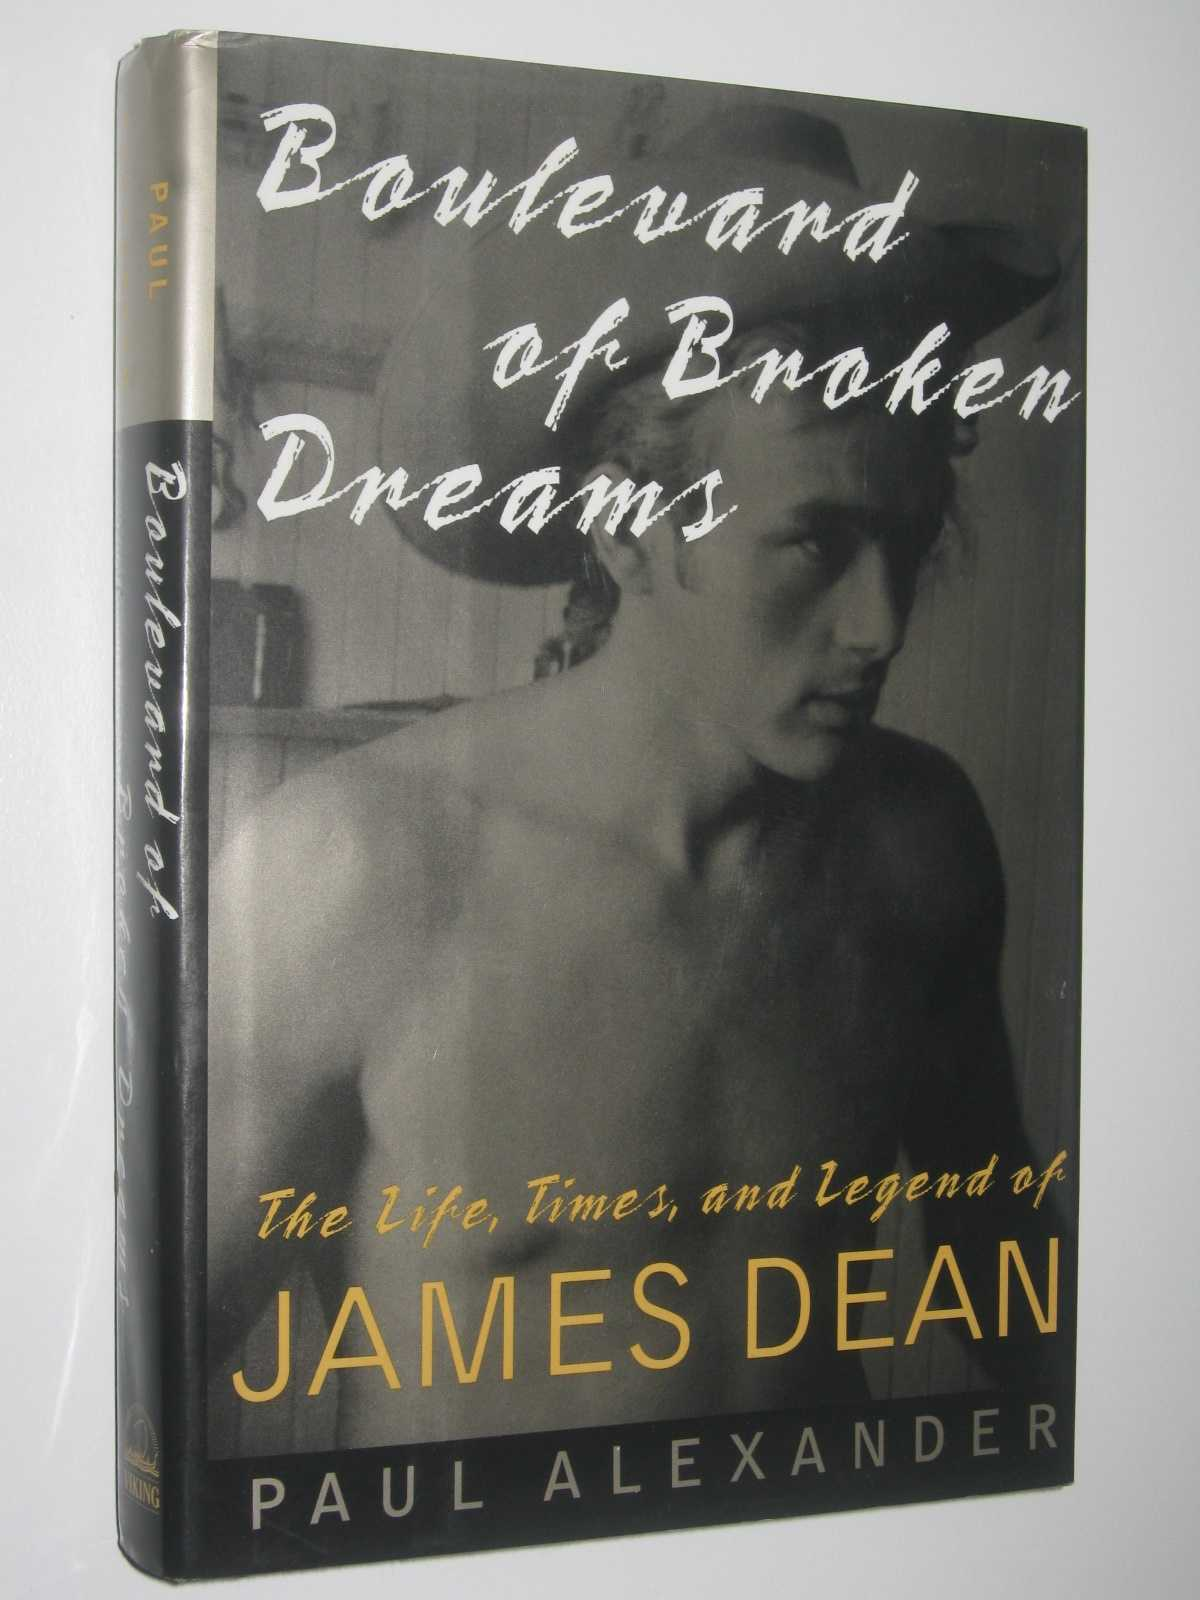 Boulevard of Broken Dreams : The Life, Times, and Legend of James Dean, Alexander, Paul